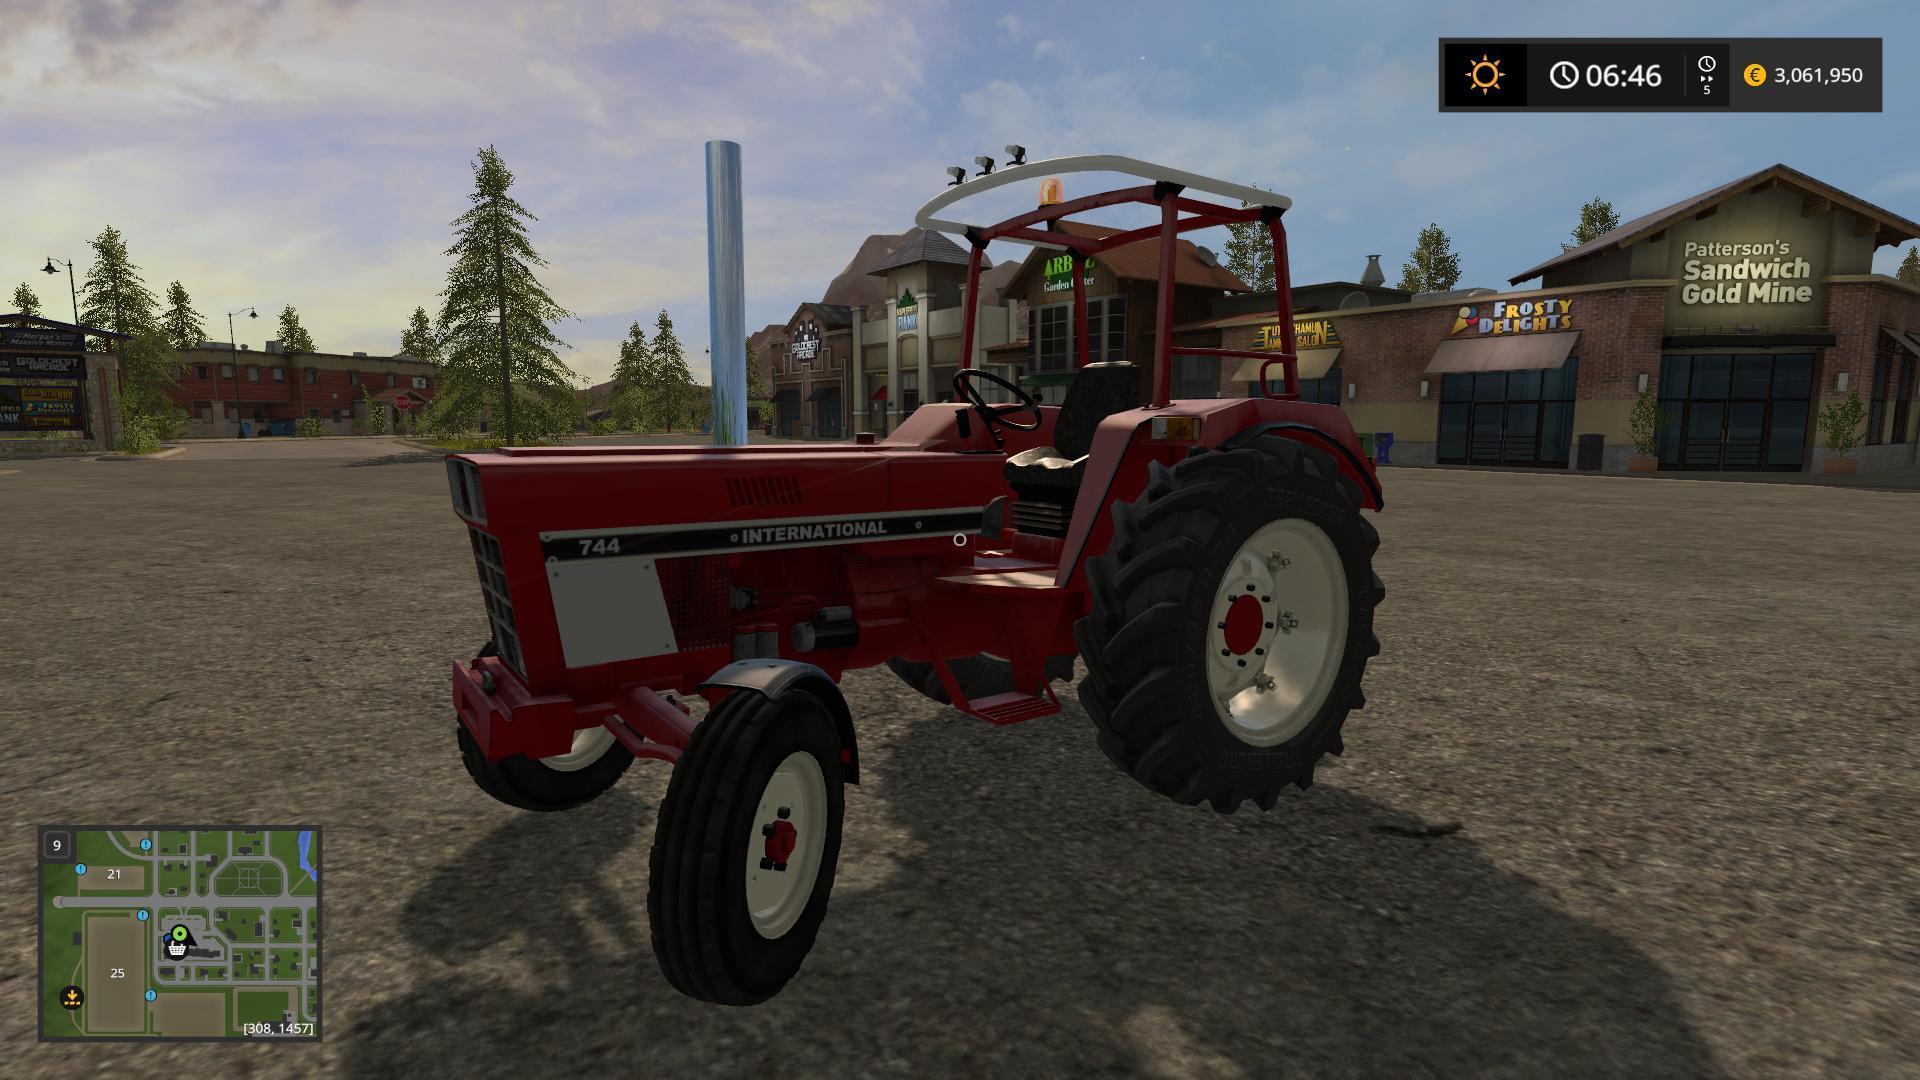 2017 Unimog Price >> IHC 744 V1.2 FS17 - Farming Simulator 17 mod / FS 2017 mod